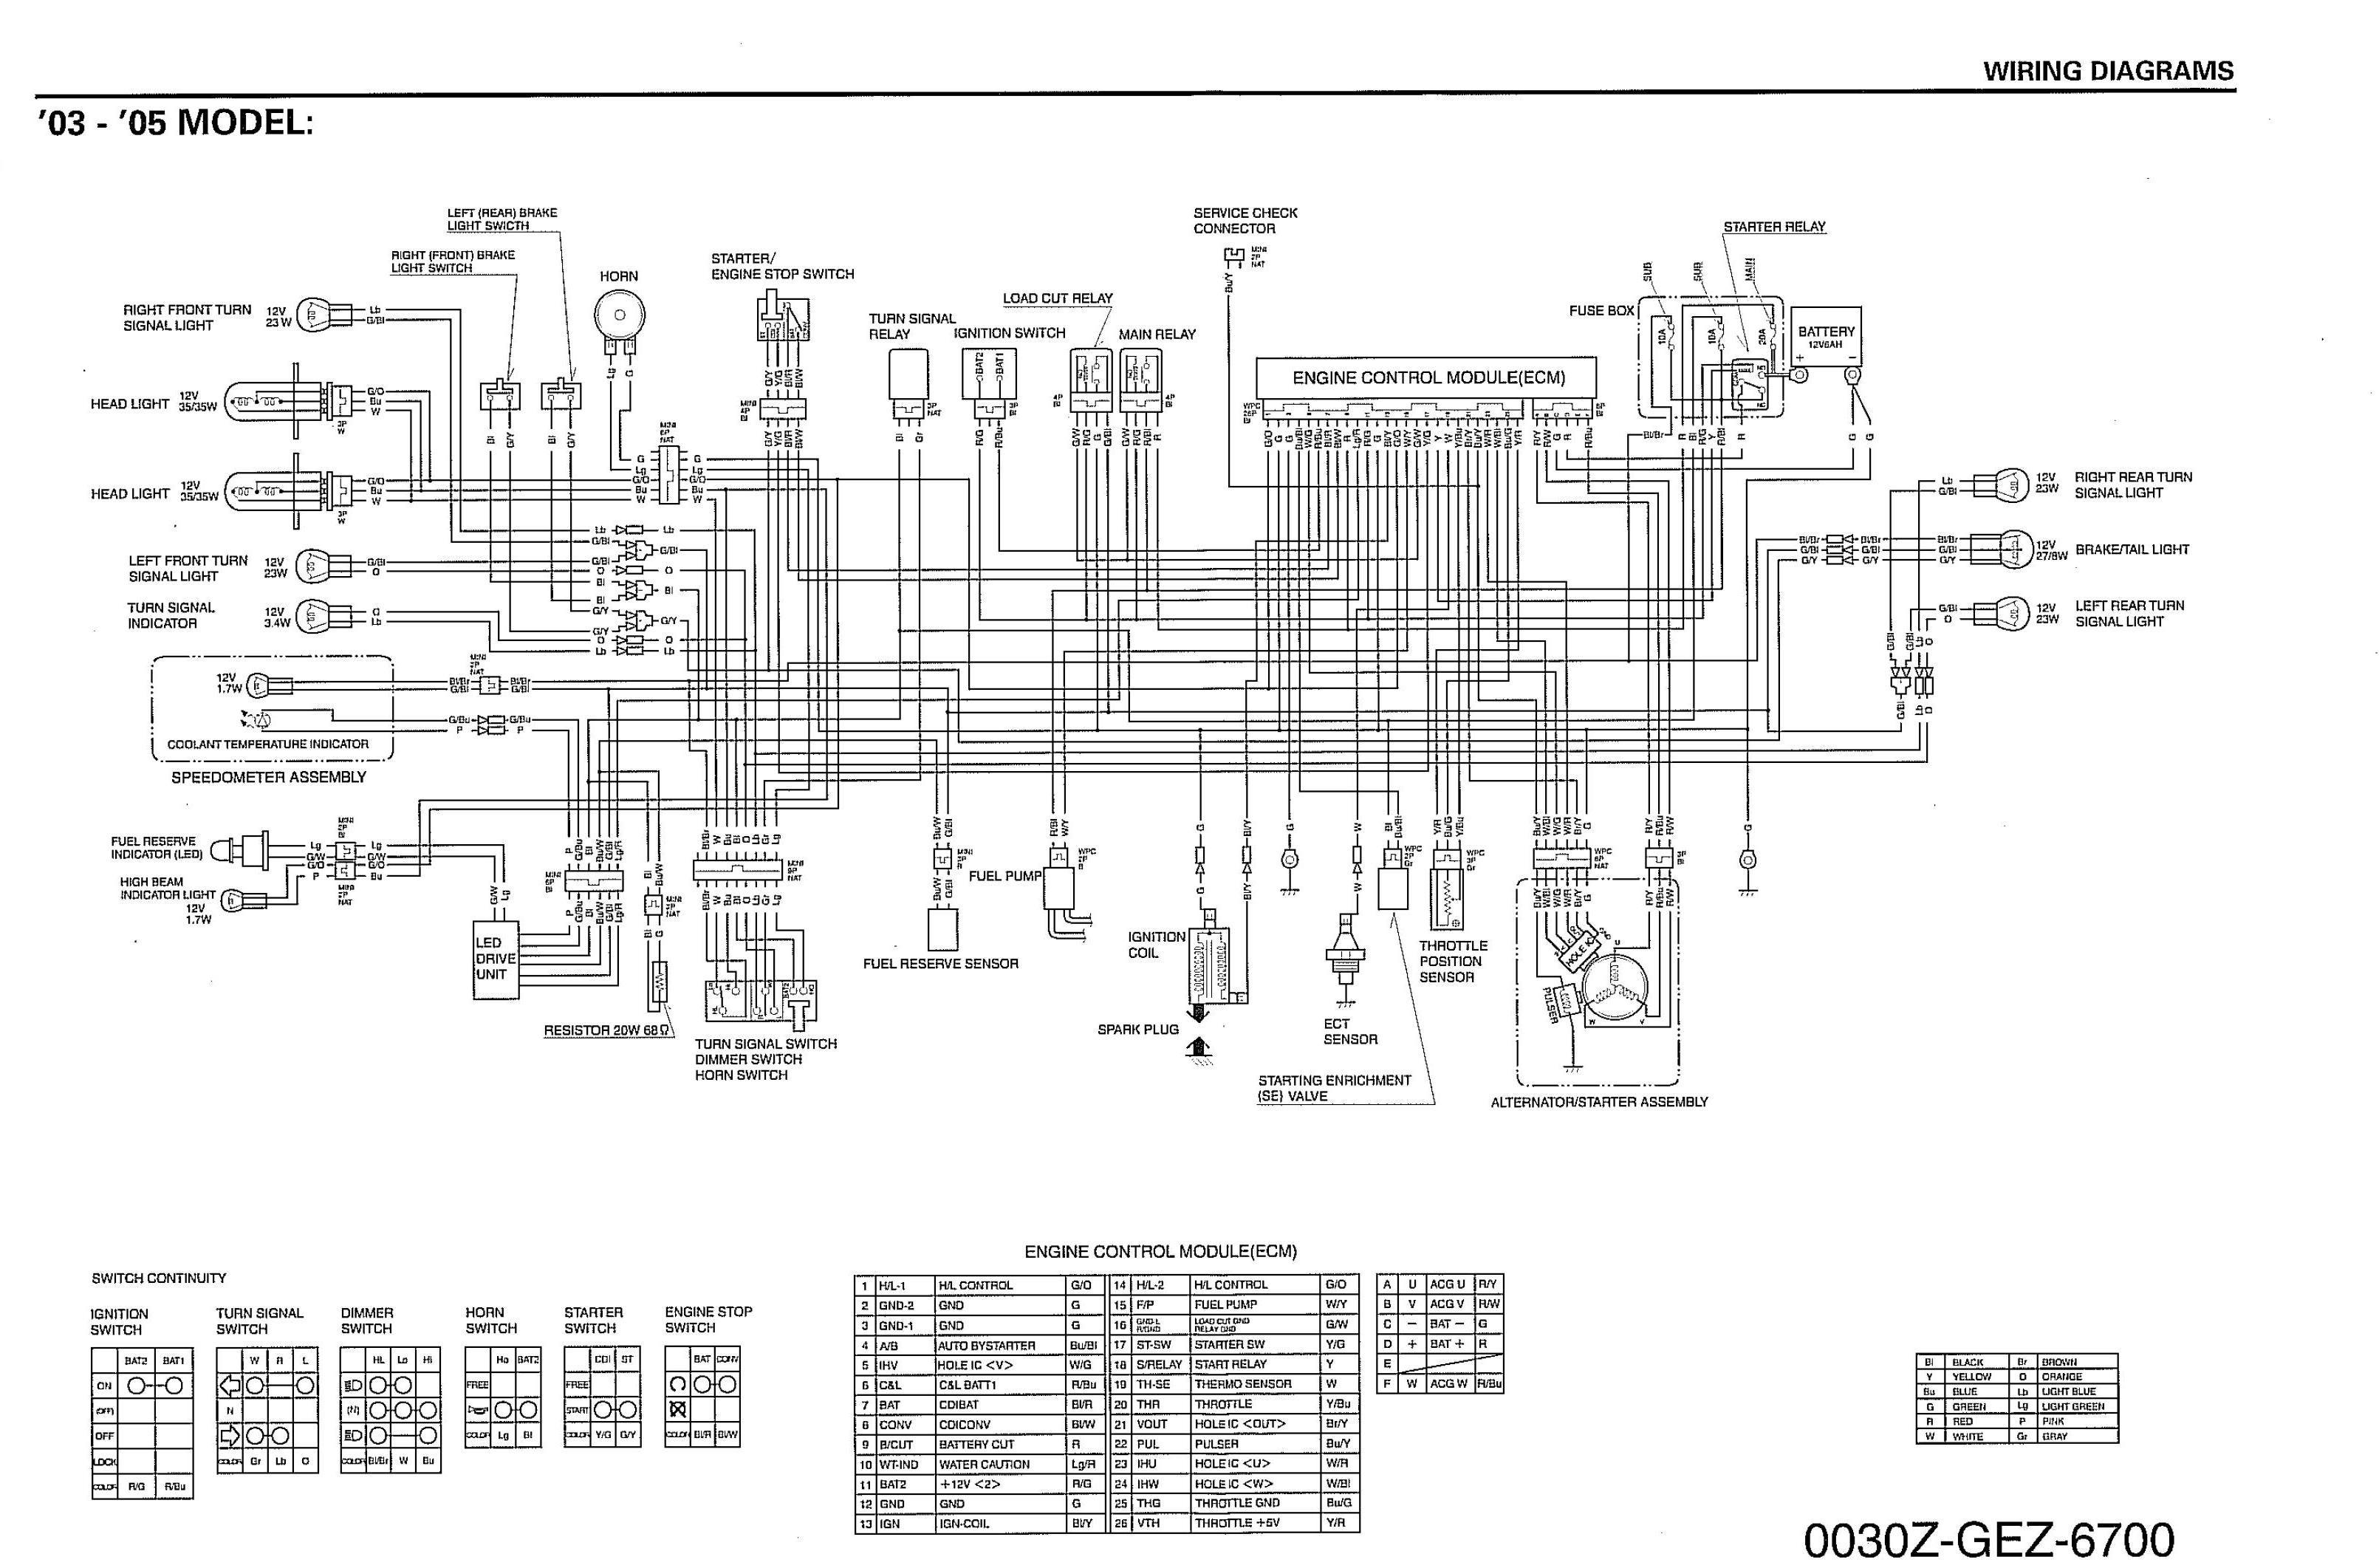 2004 Saturn Vue Power Lock Wiring Diagram Content Resource Of L300 Fuse Box For Bmw X3 Imageresizertool Com Radiator Fan